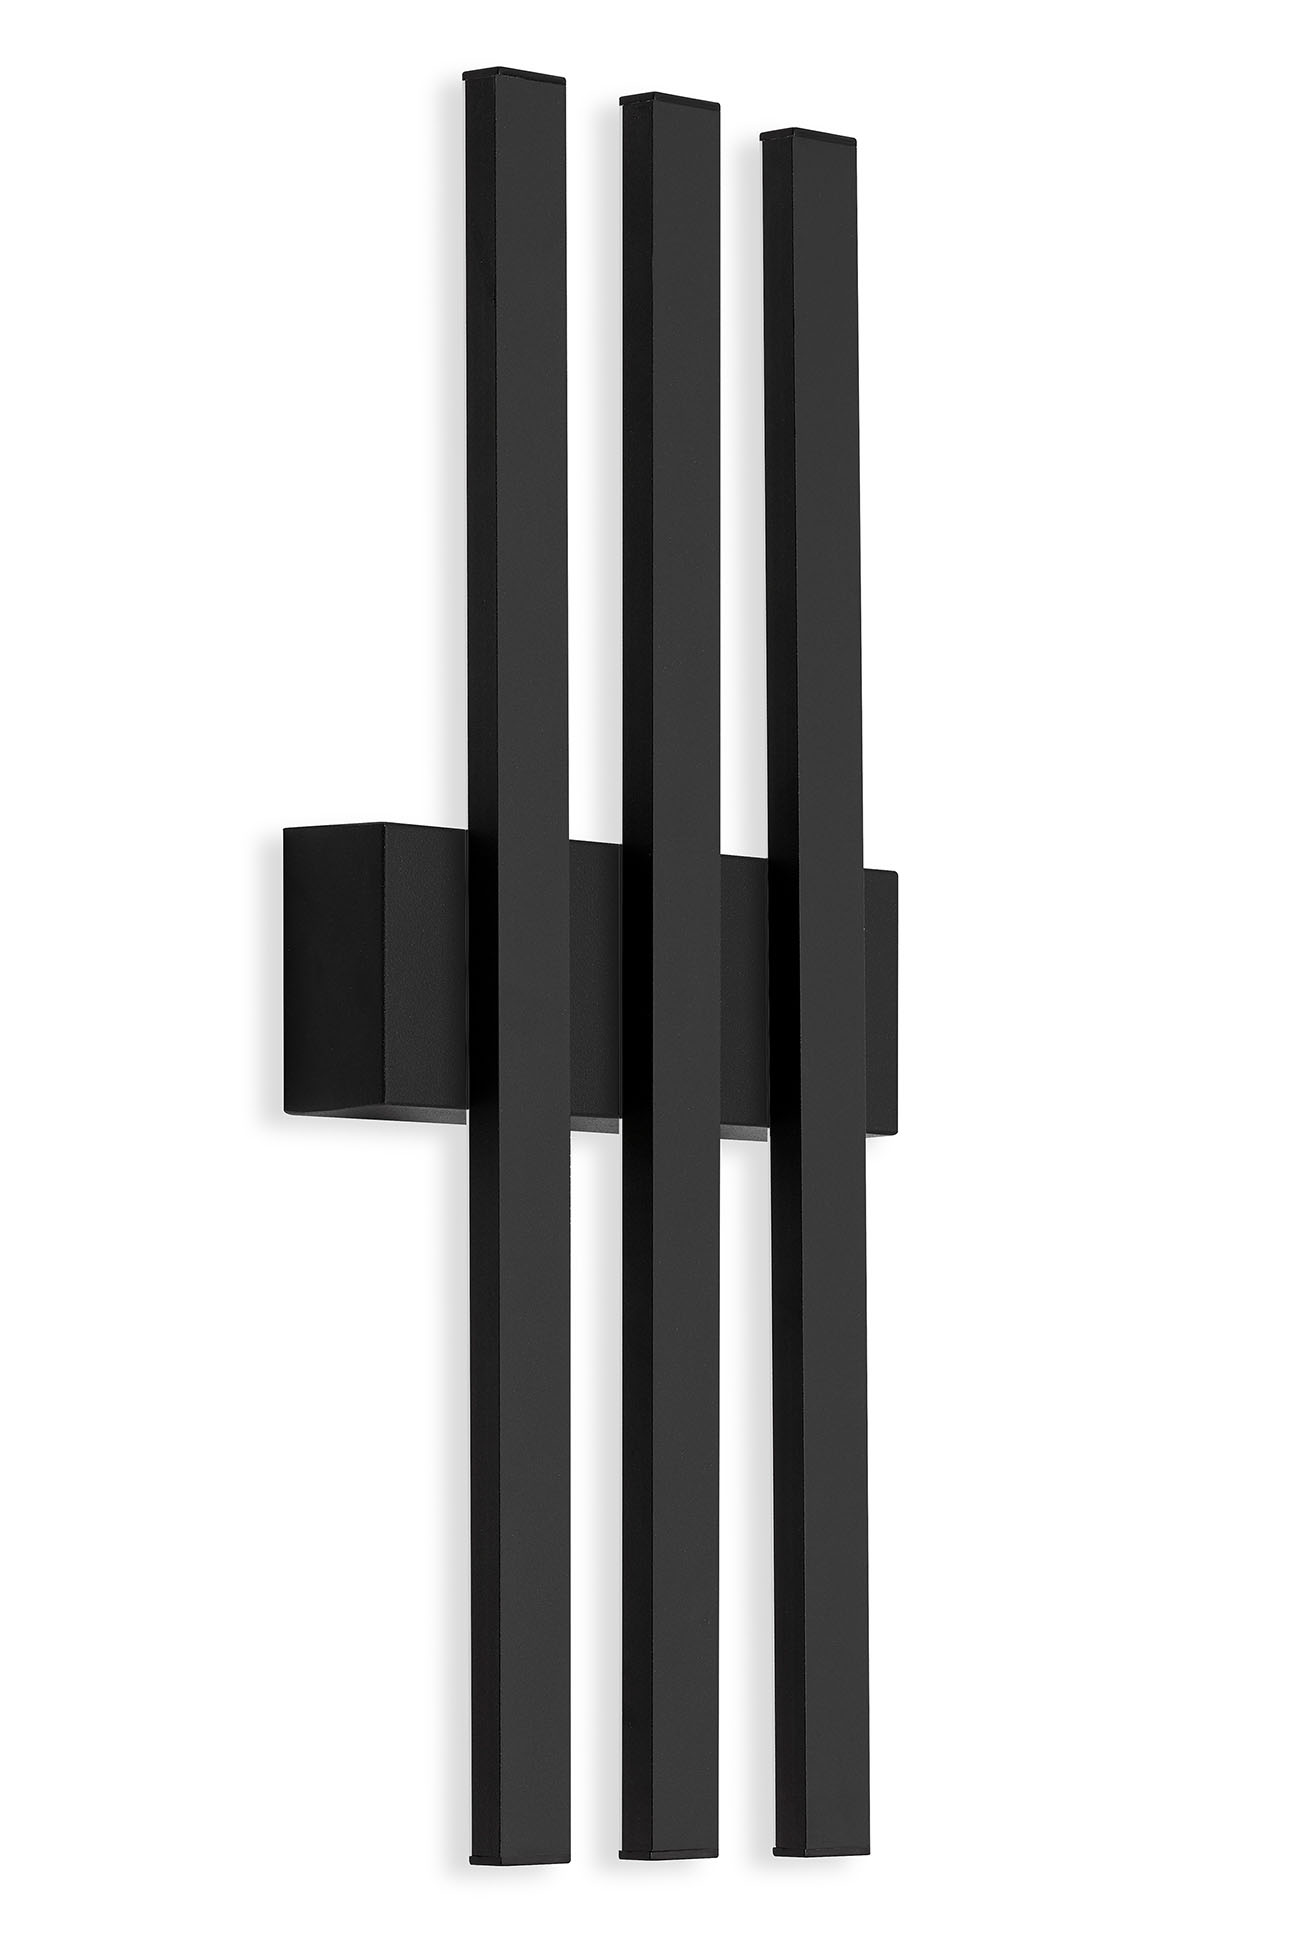 TELEFUNKEN LED Aussenwandleuchte, 37 cm, 12 W, Schwarz